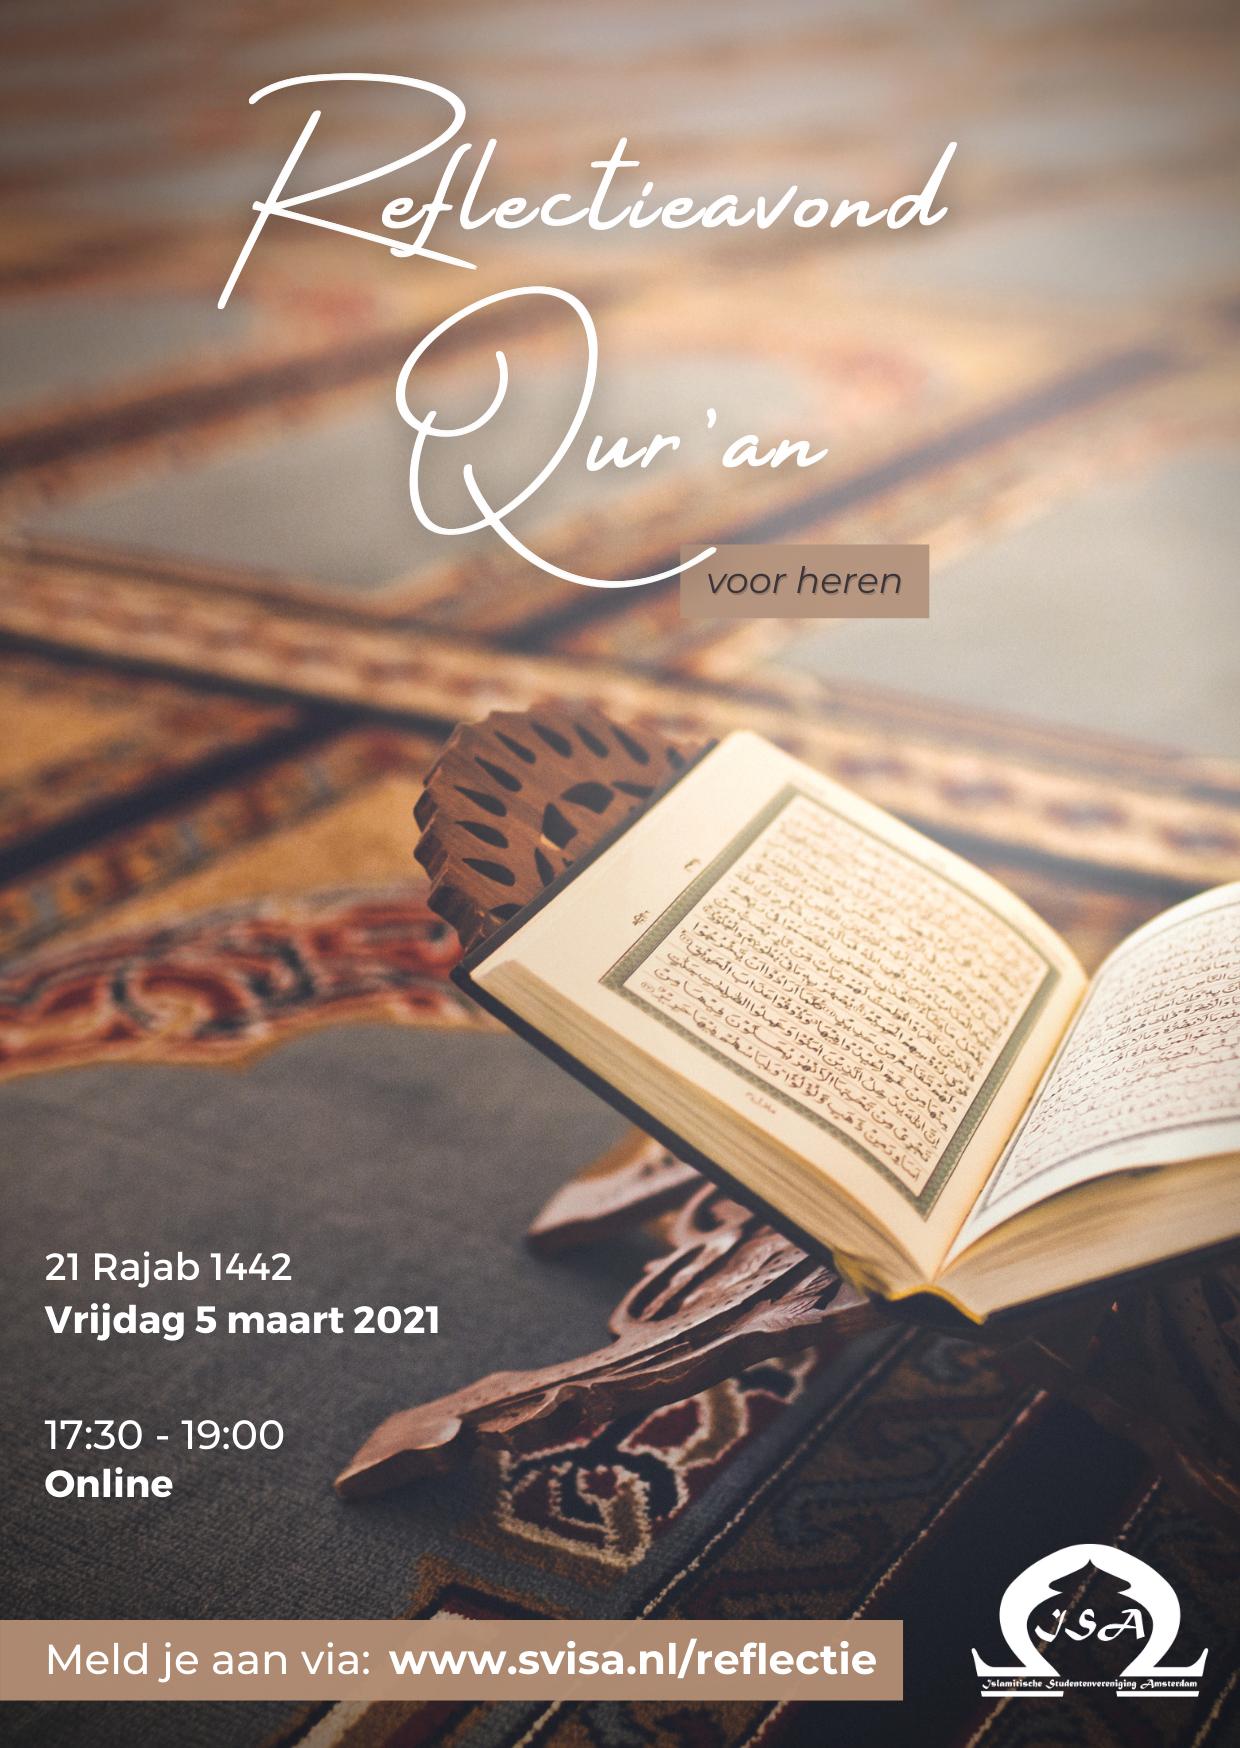 Flyer_reflectie_quran